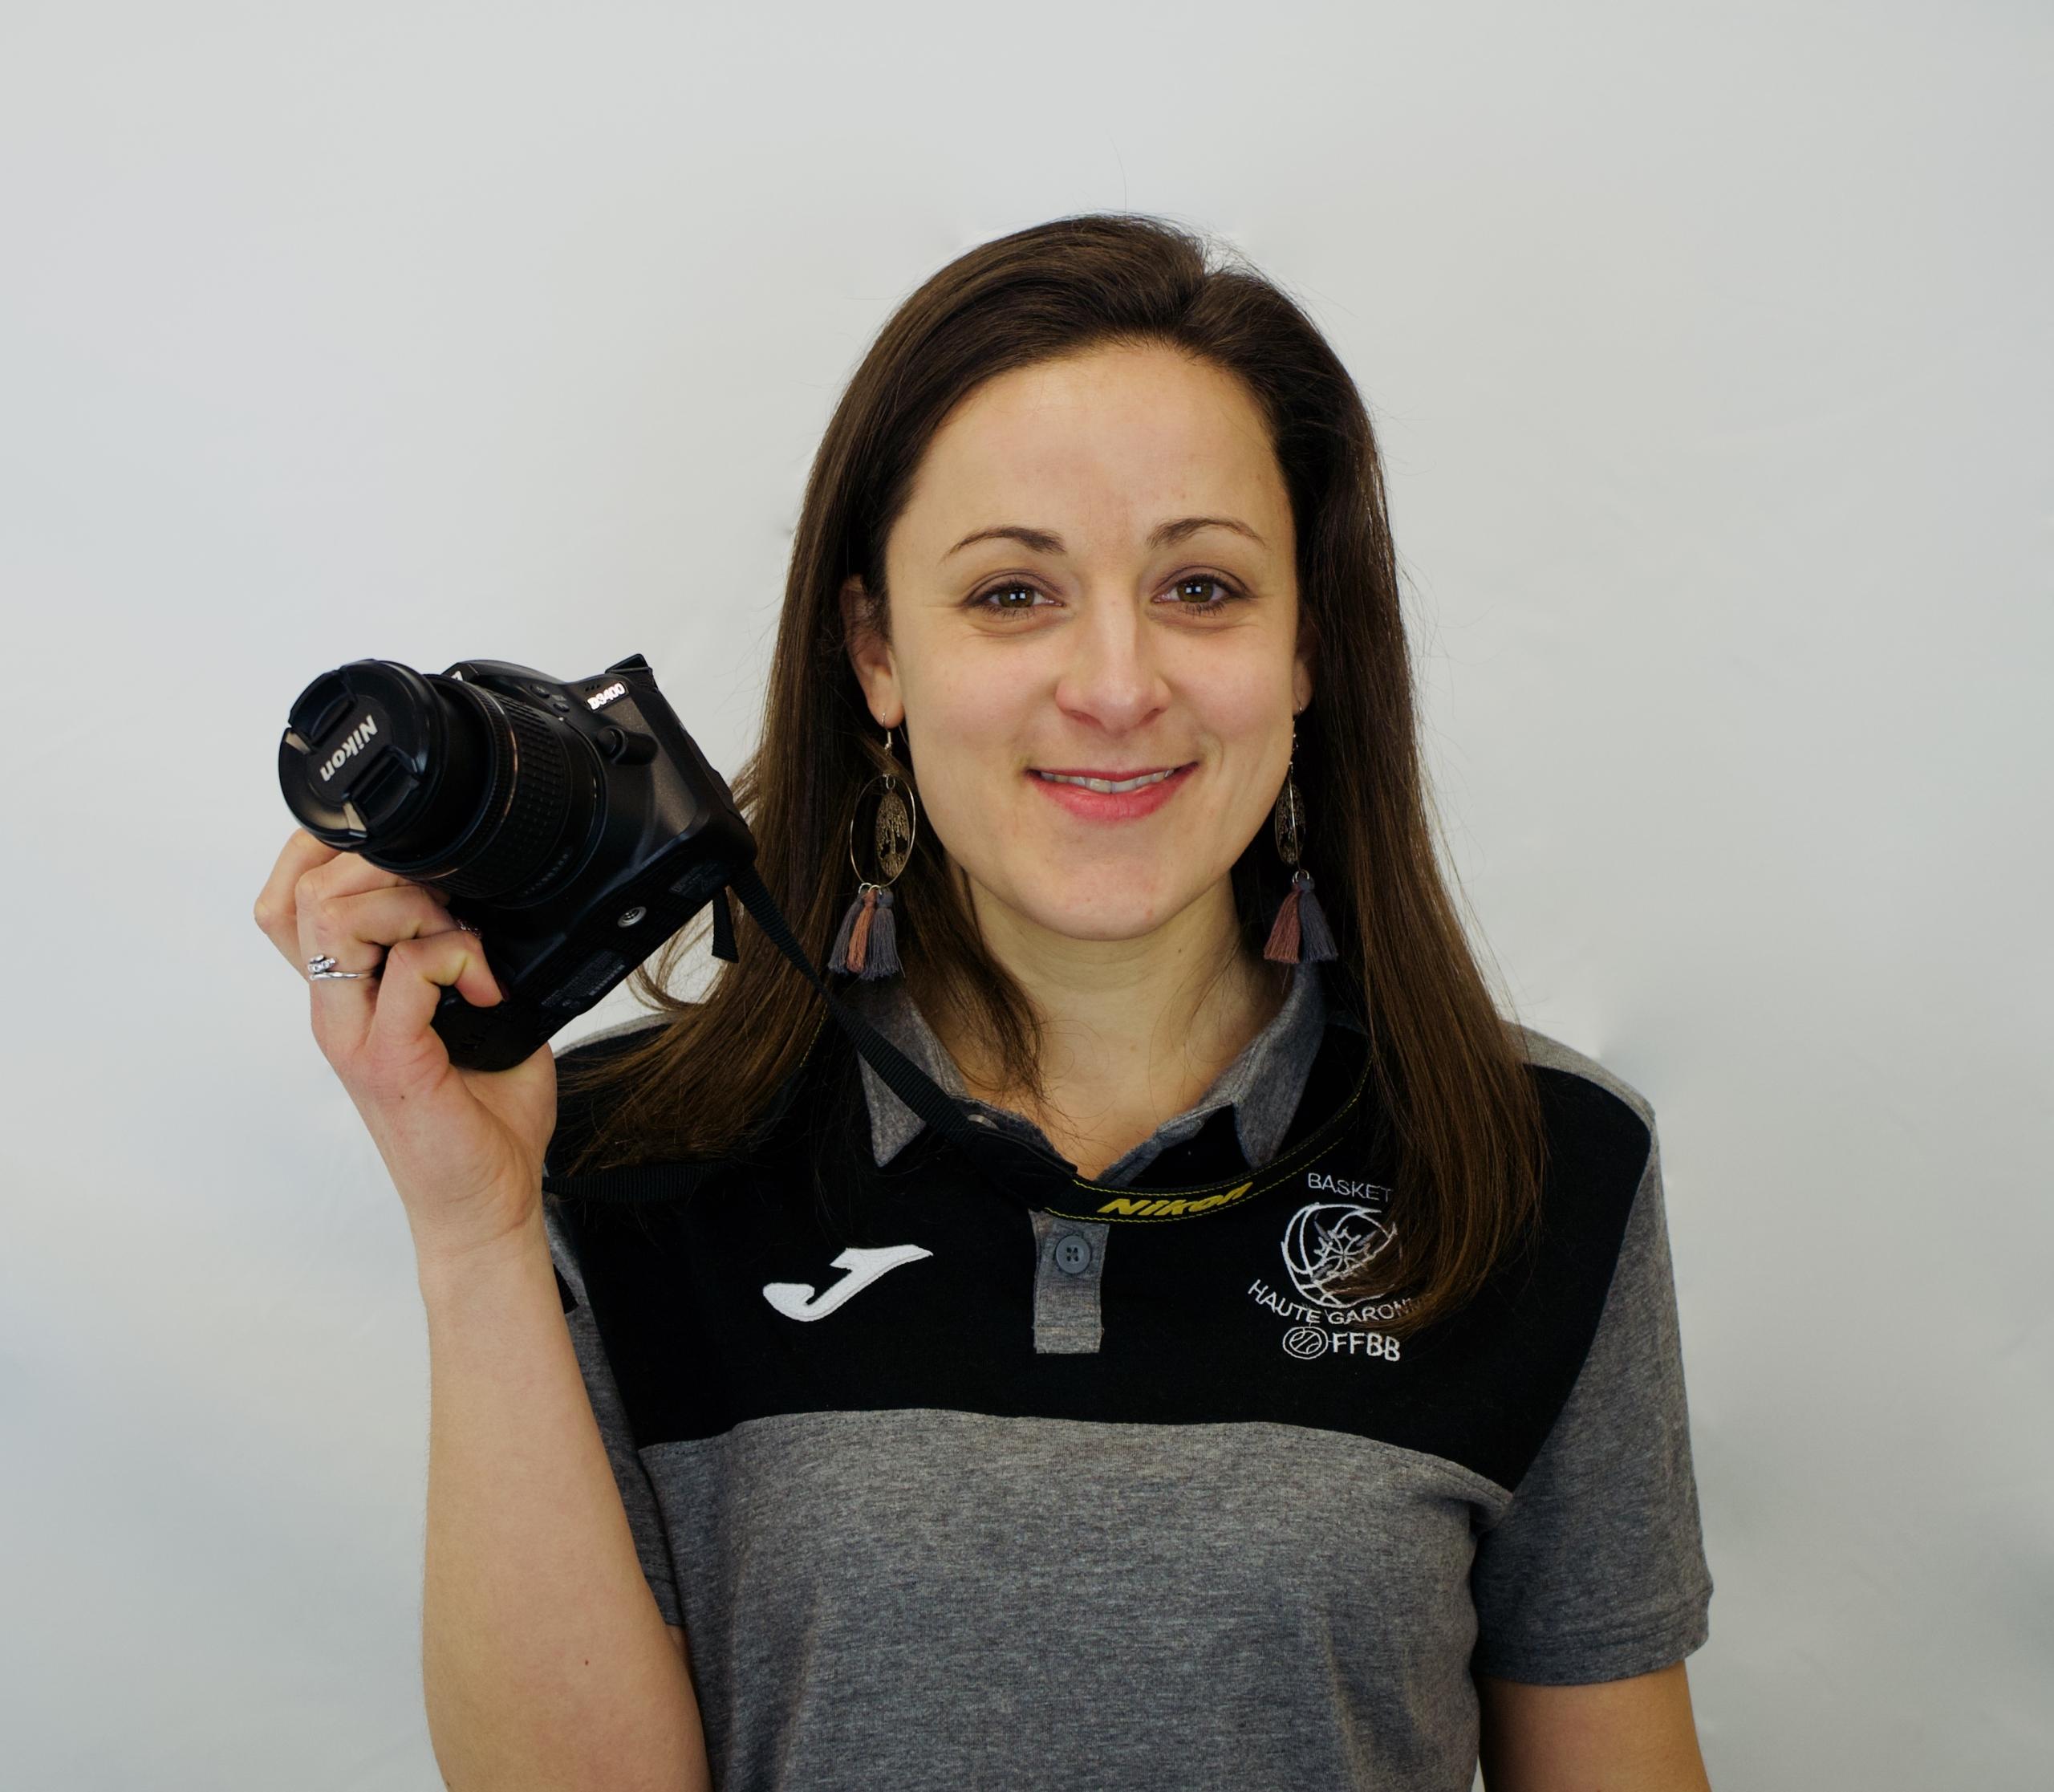 Céline GUIRAUD